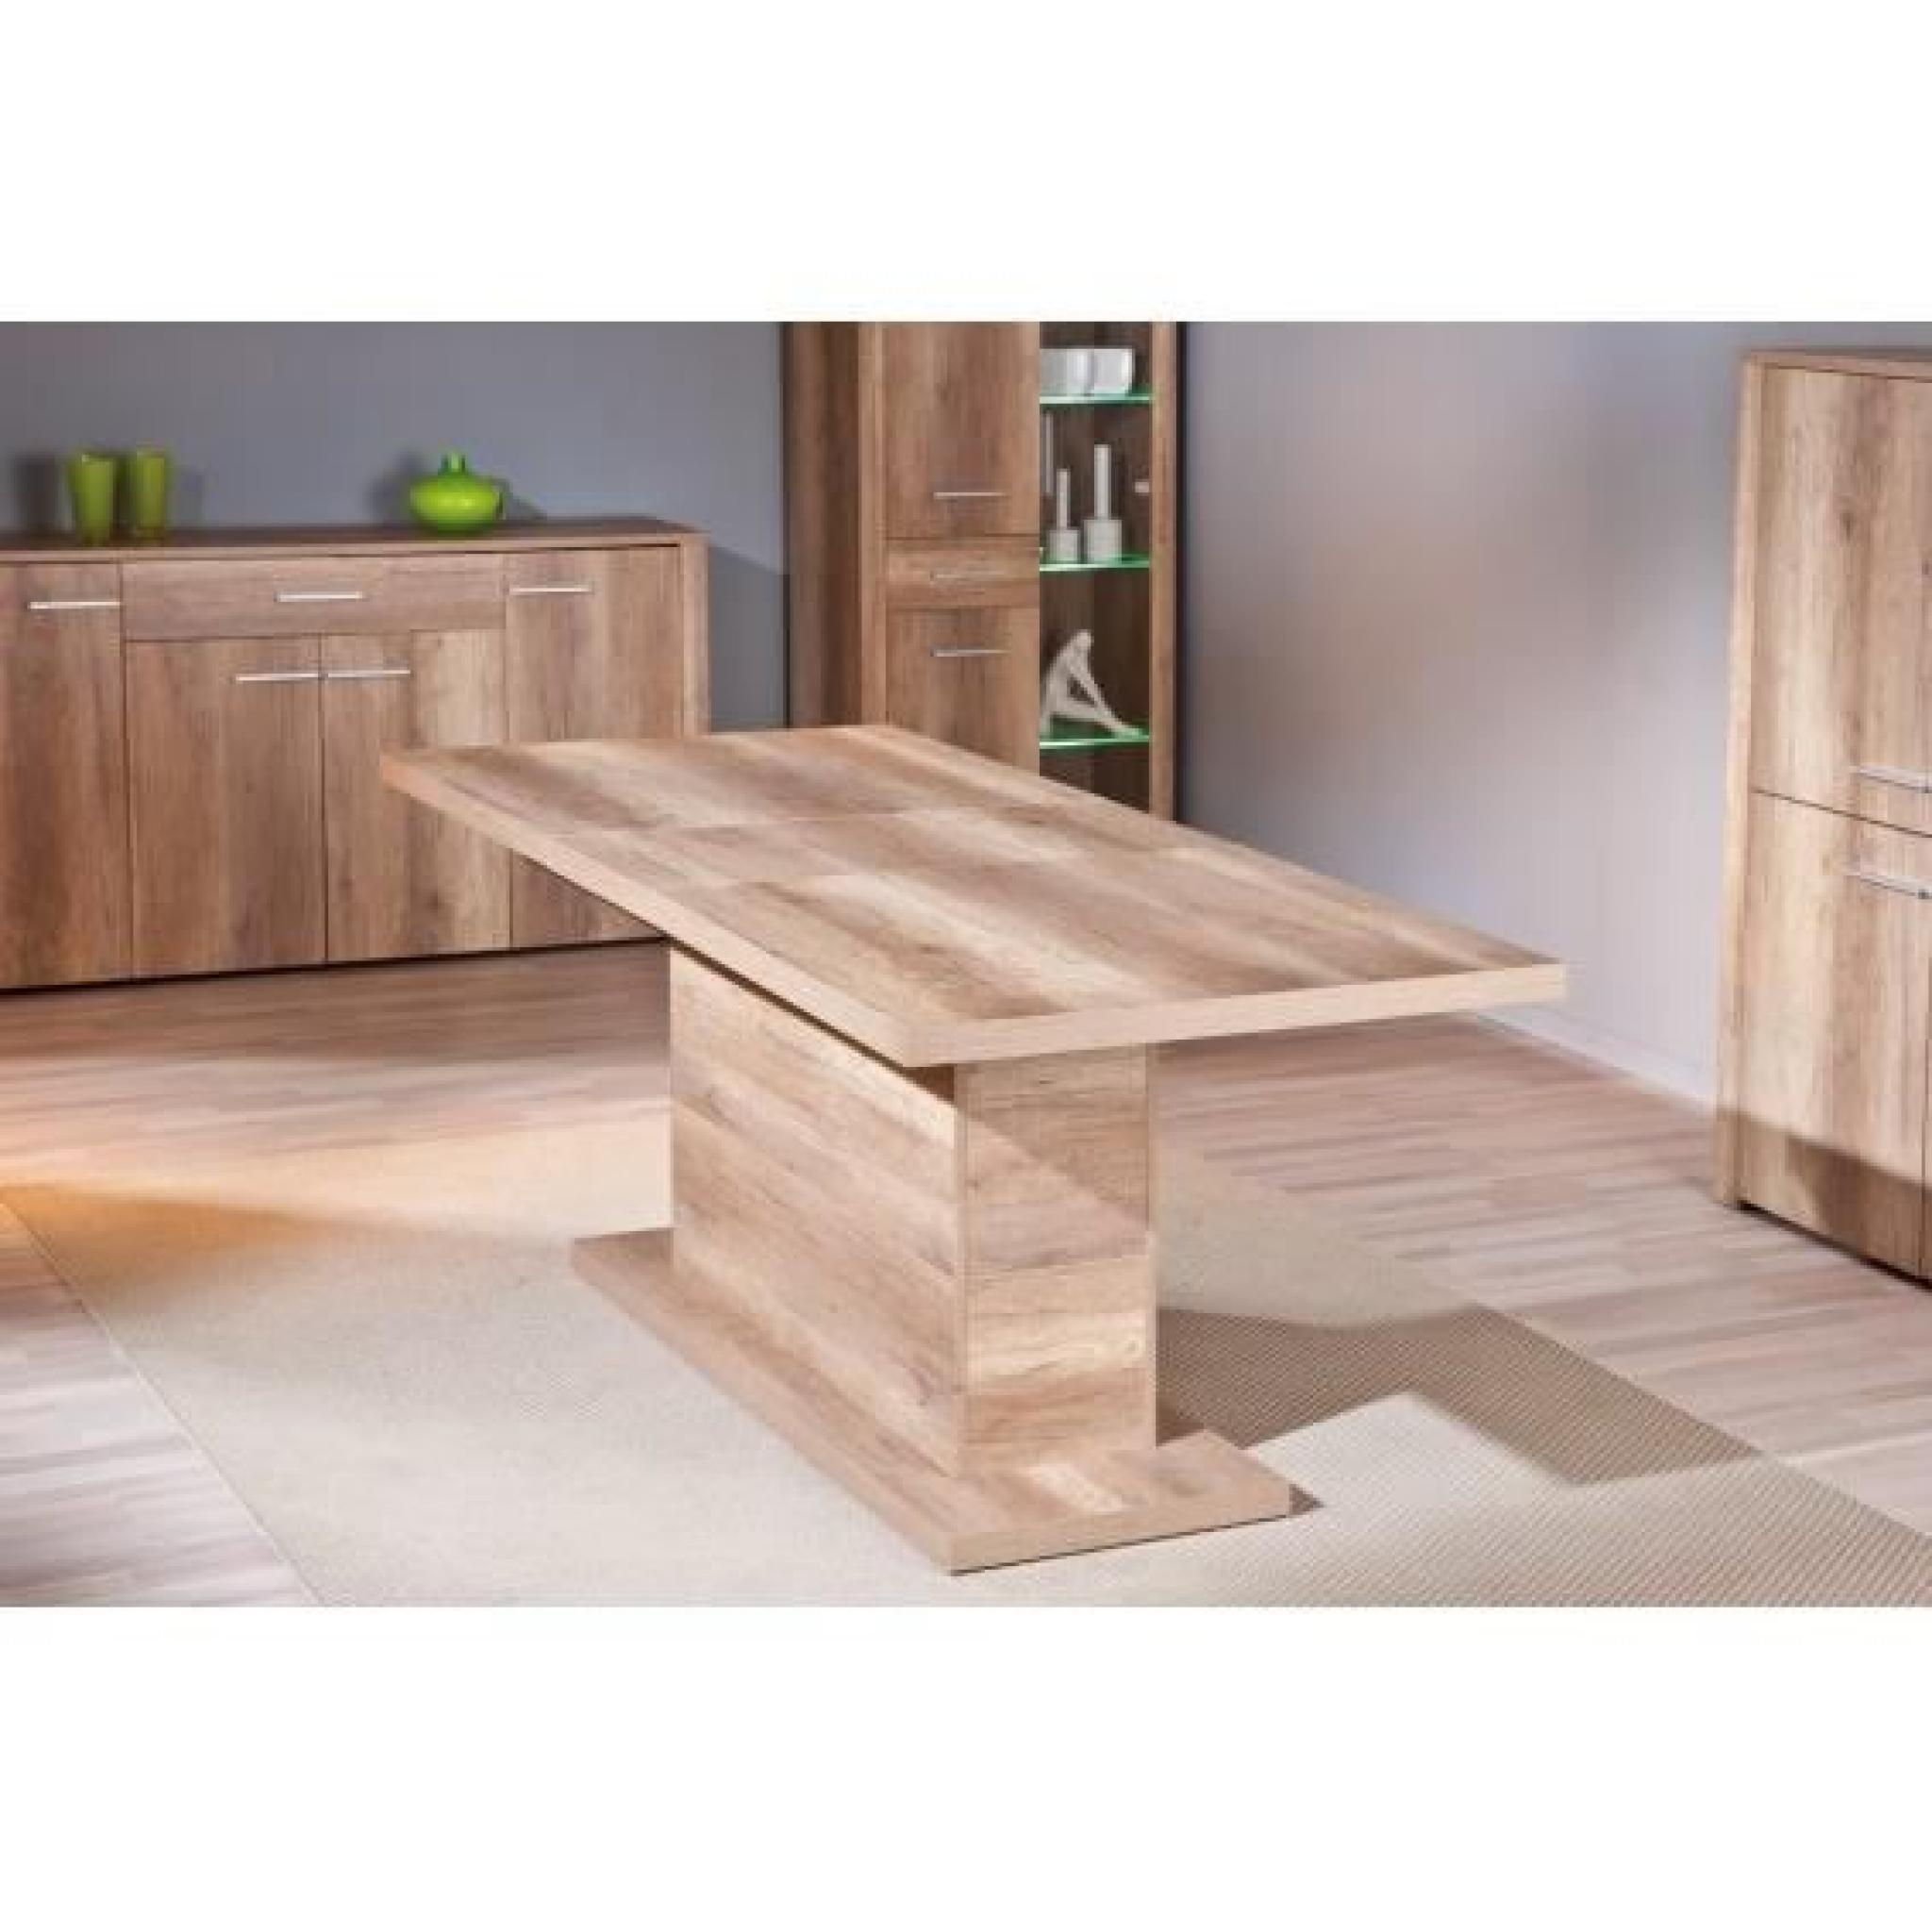 myca ch ne table pied central avec allonge achat vente. Black Bedroom Furniture Sets. Home Design Ideas